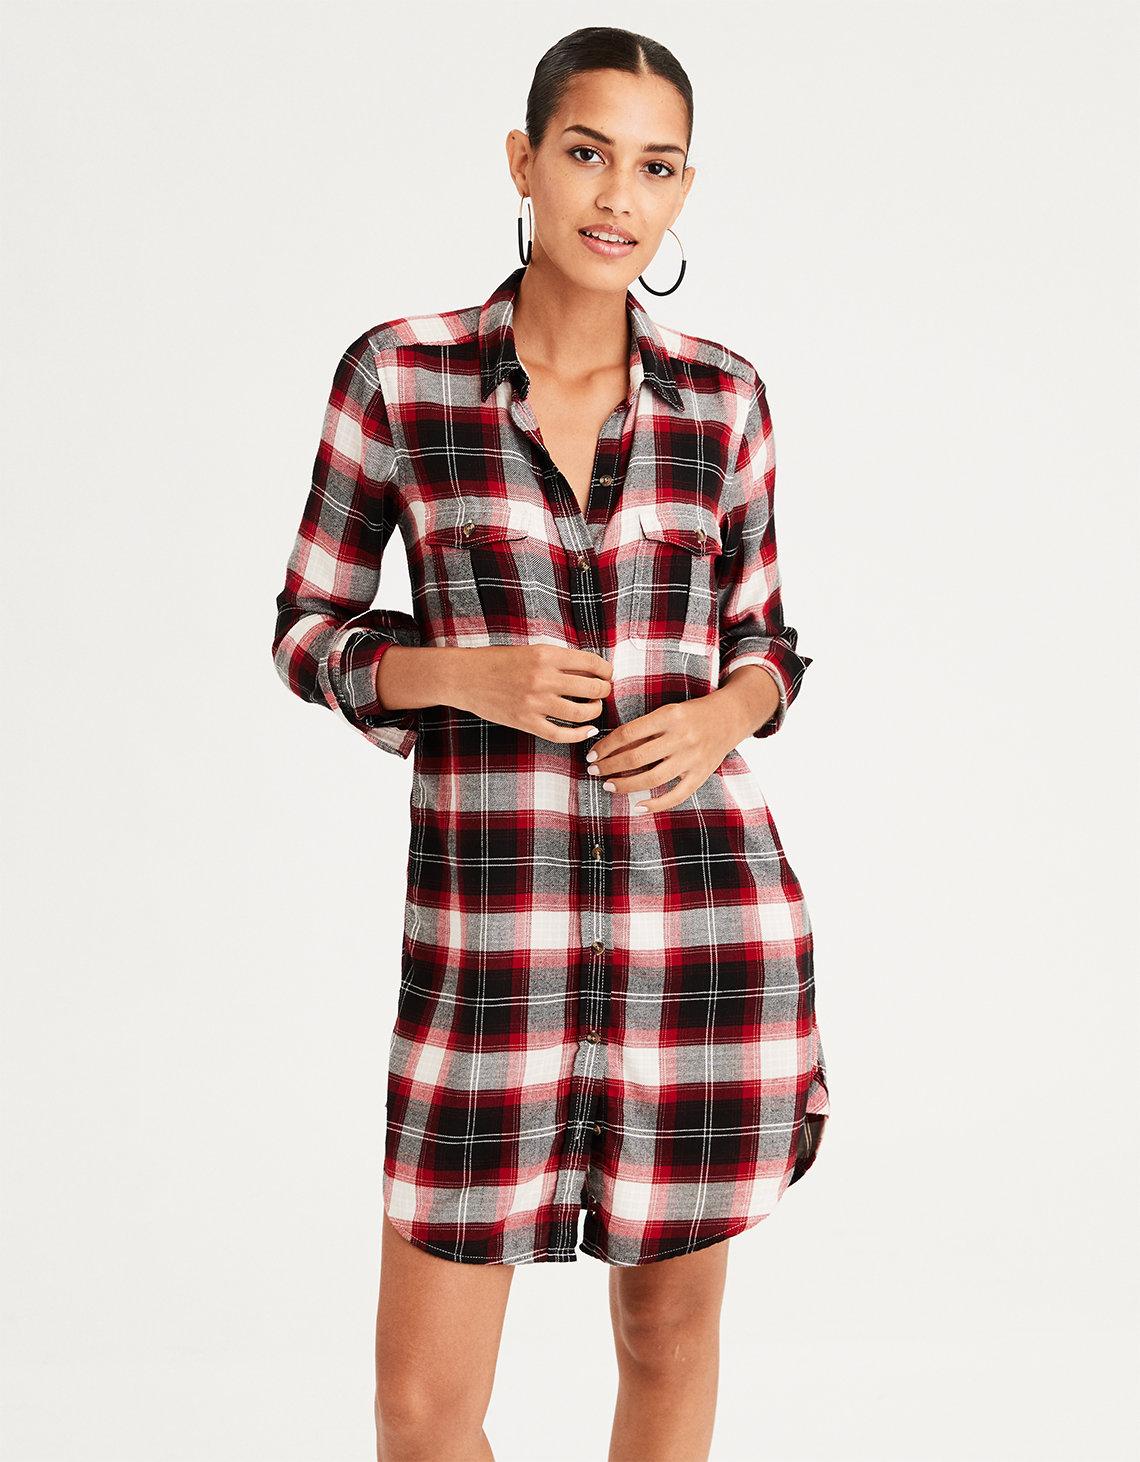 bf09fe8c4 AE Plaid Button Front Shirt Dress